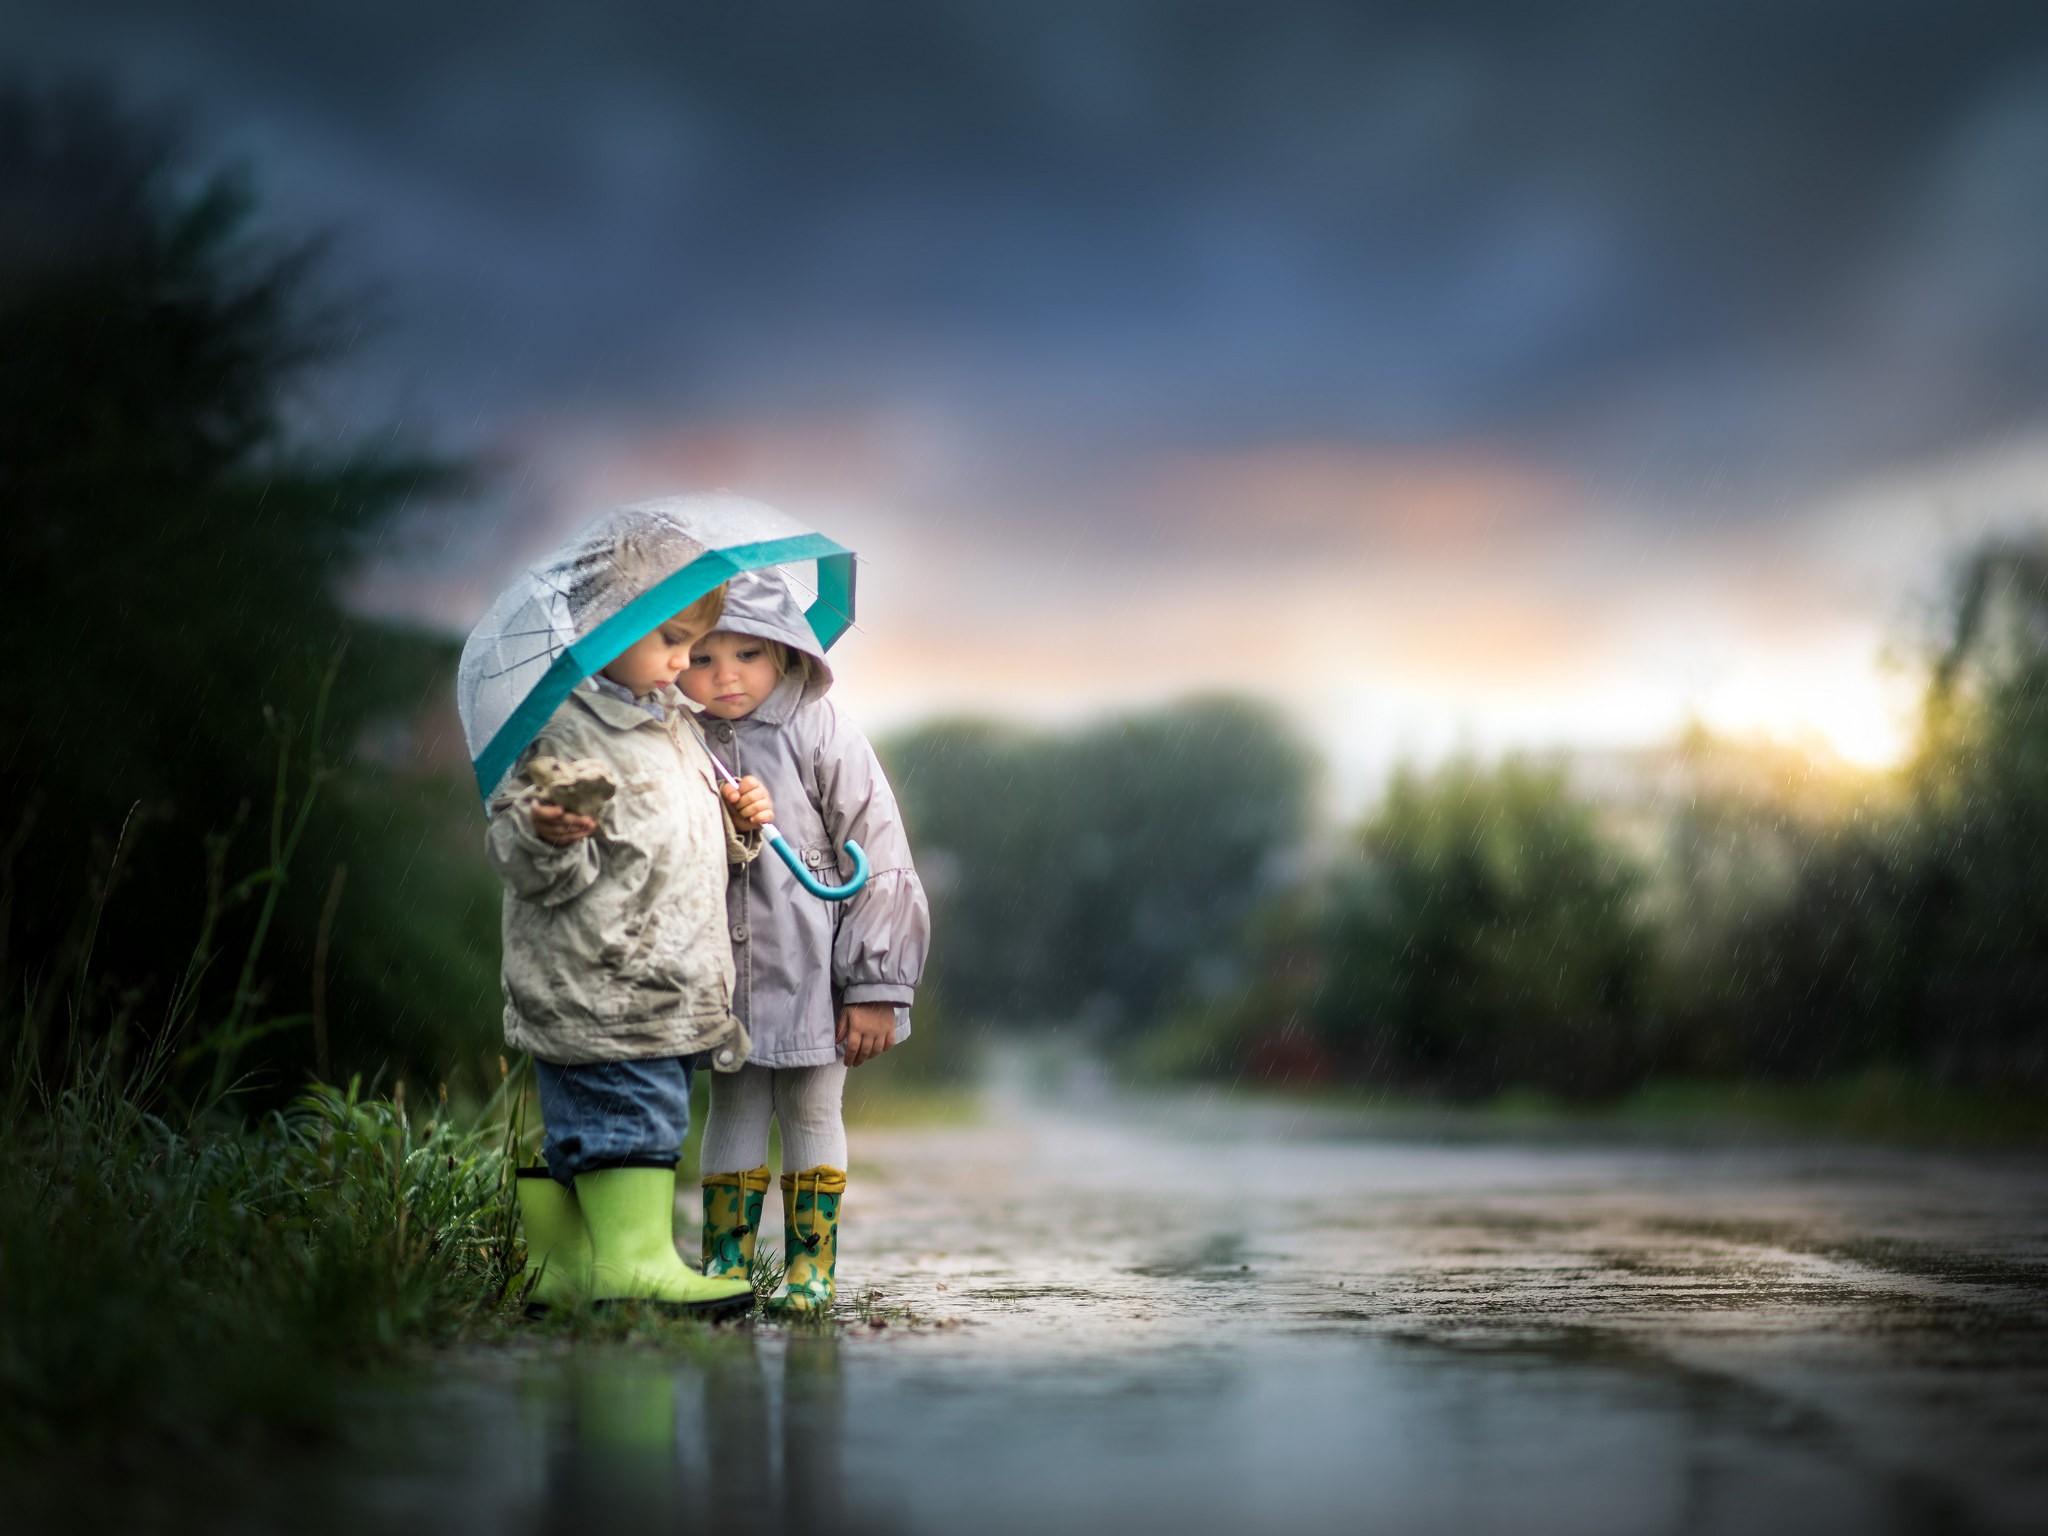 Wallpaper : Sunlight, Nature, Reflection, Rain, Umbrella